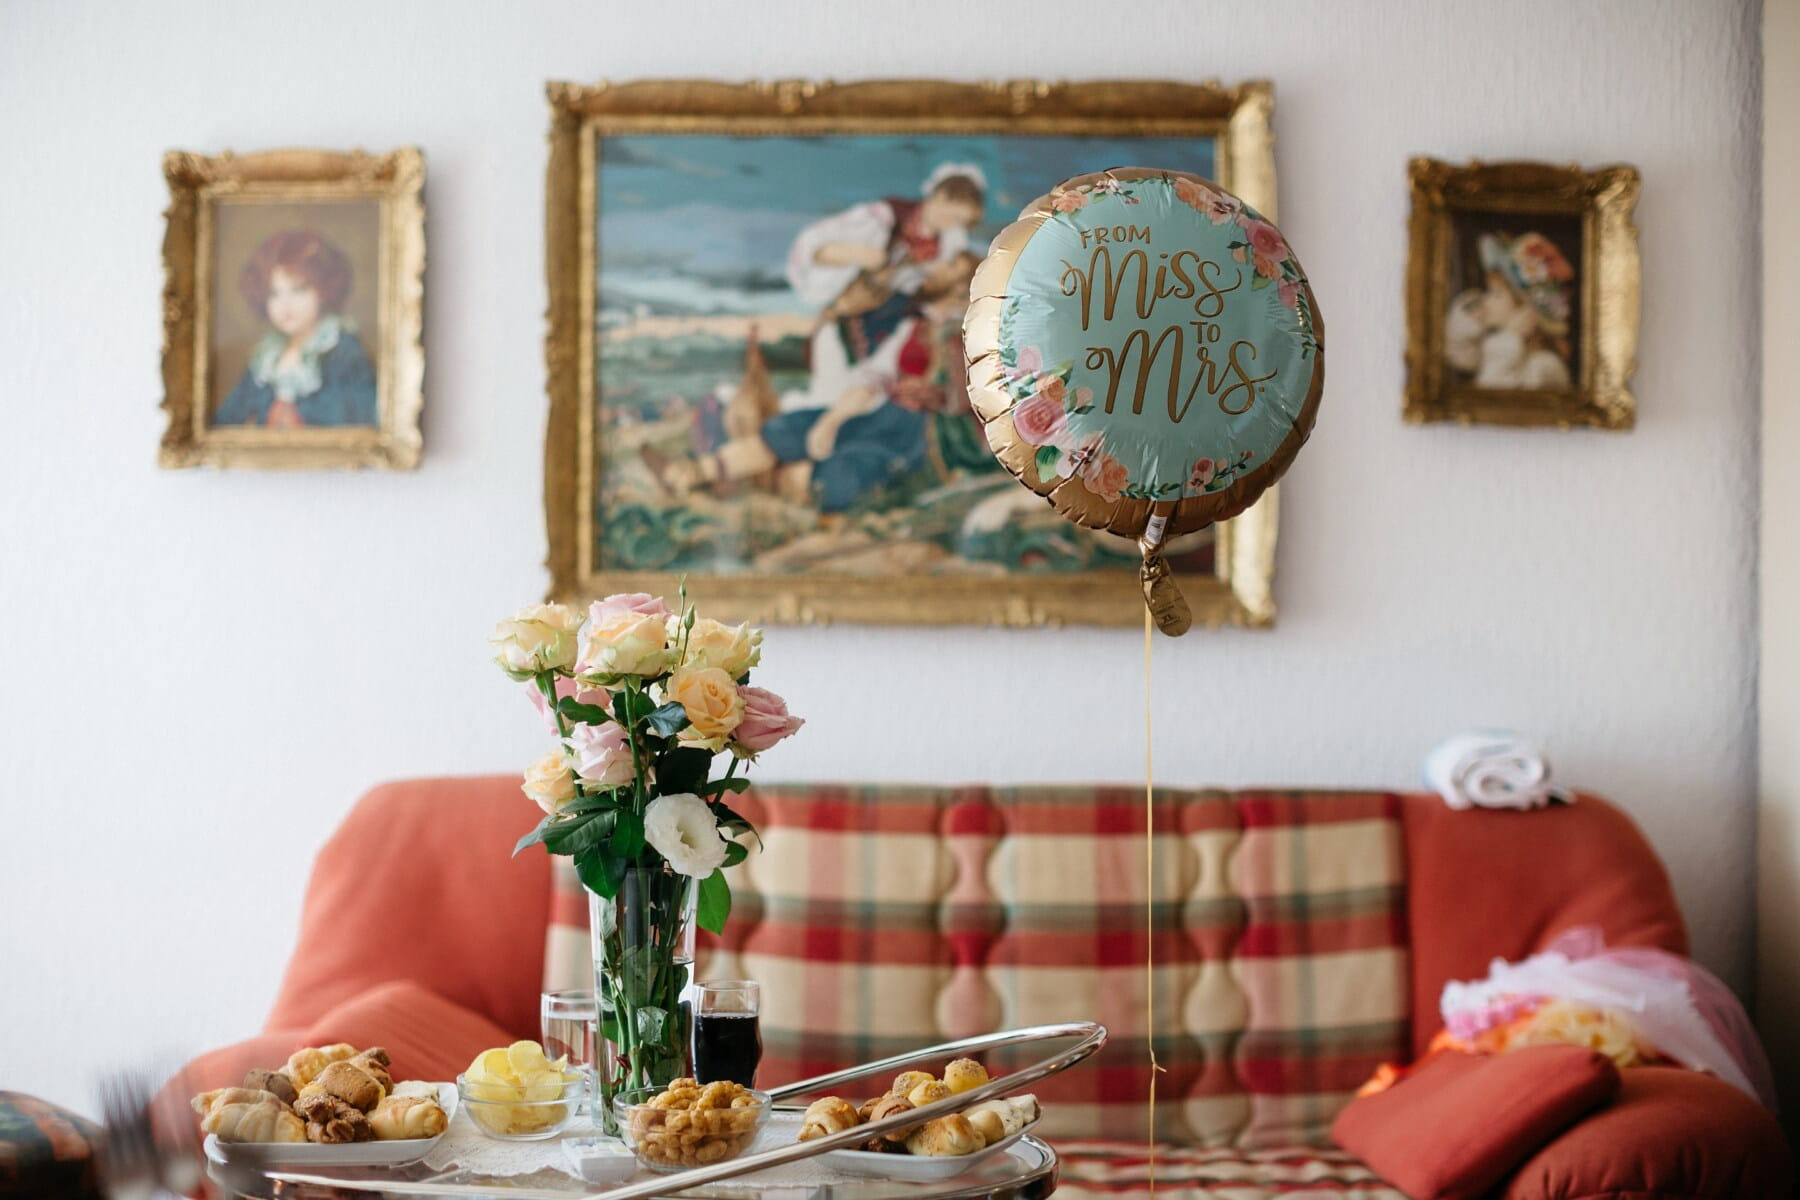 sofa, living room, decoration, interior design, traditional, Serbia, balloon, structure, altar, furniture